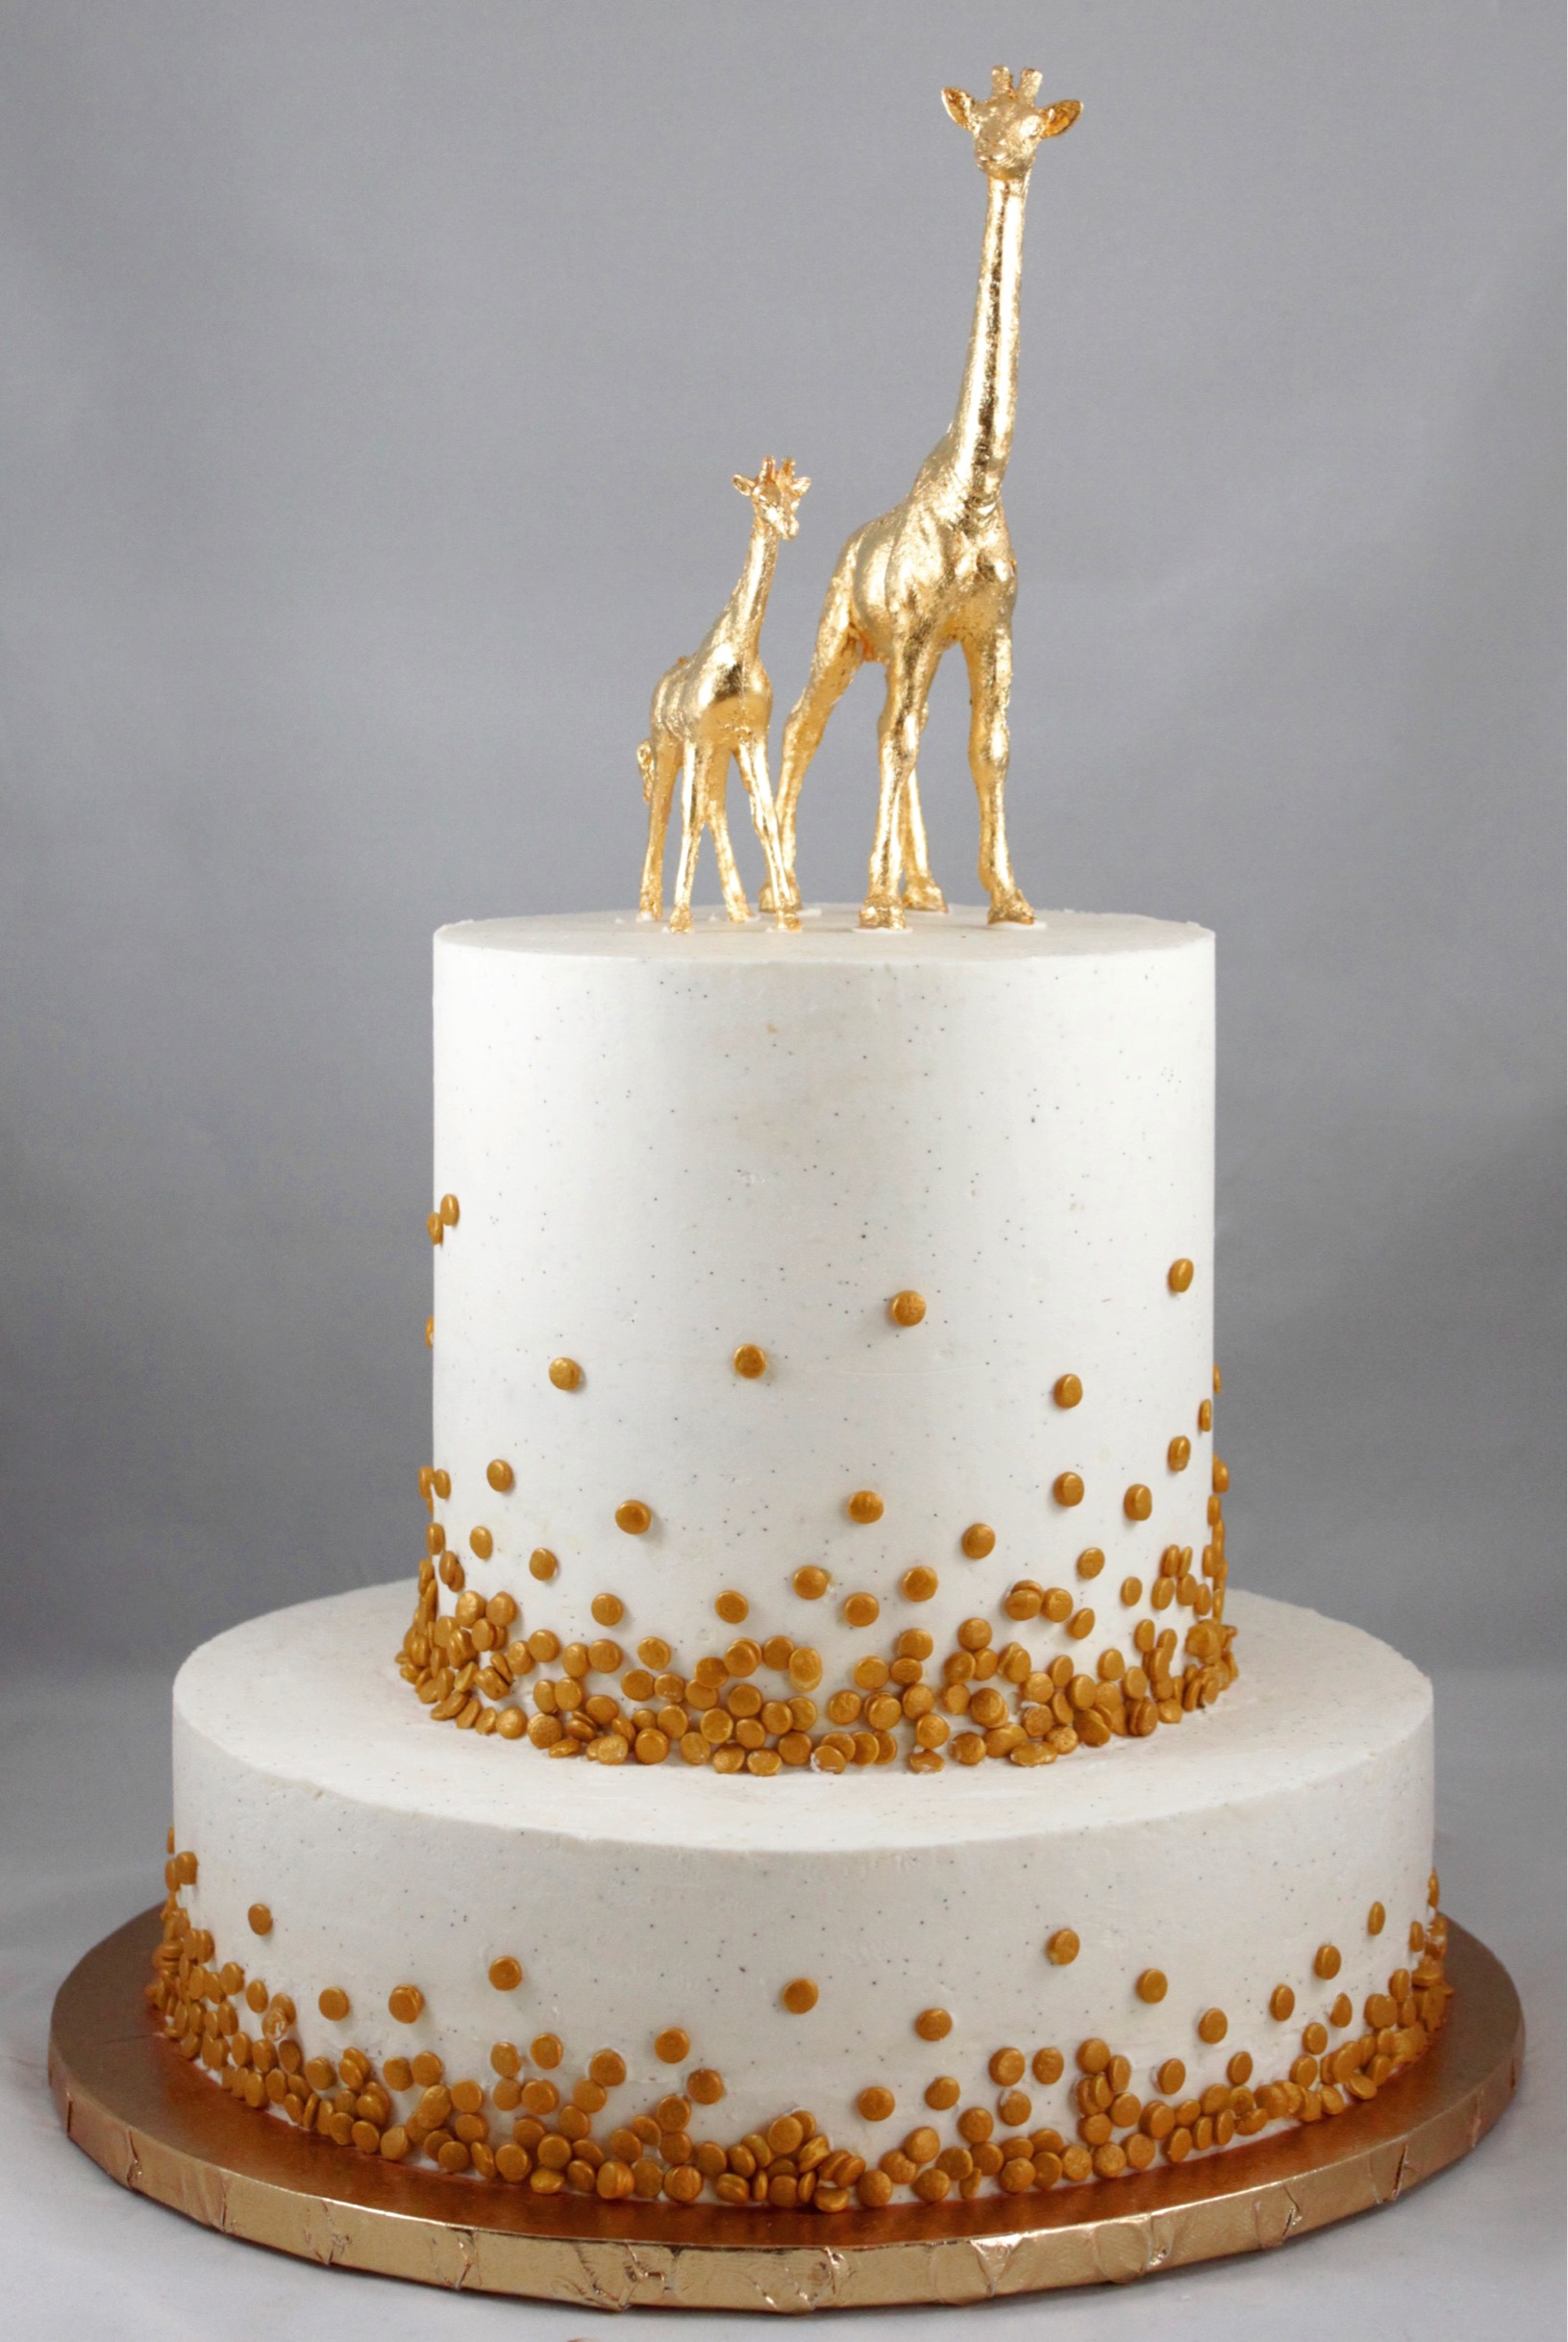 BUTTERCREAM GIRAFFE CAKE